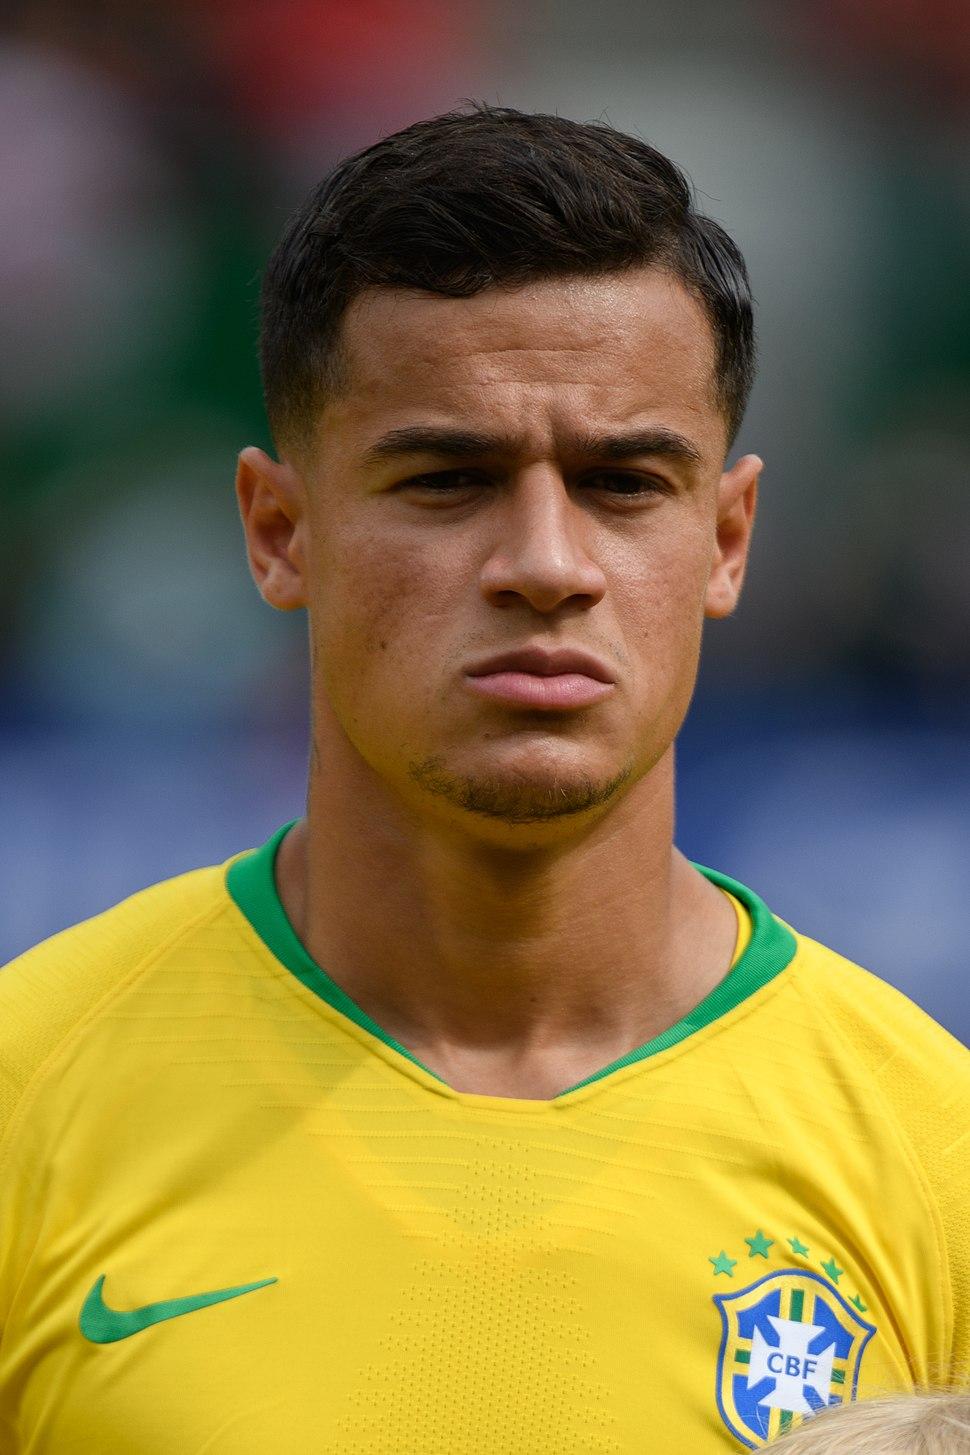 20180610 FIFA Friendly Match Austria vs. Brazil Philippe Coutinho 850 1692